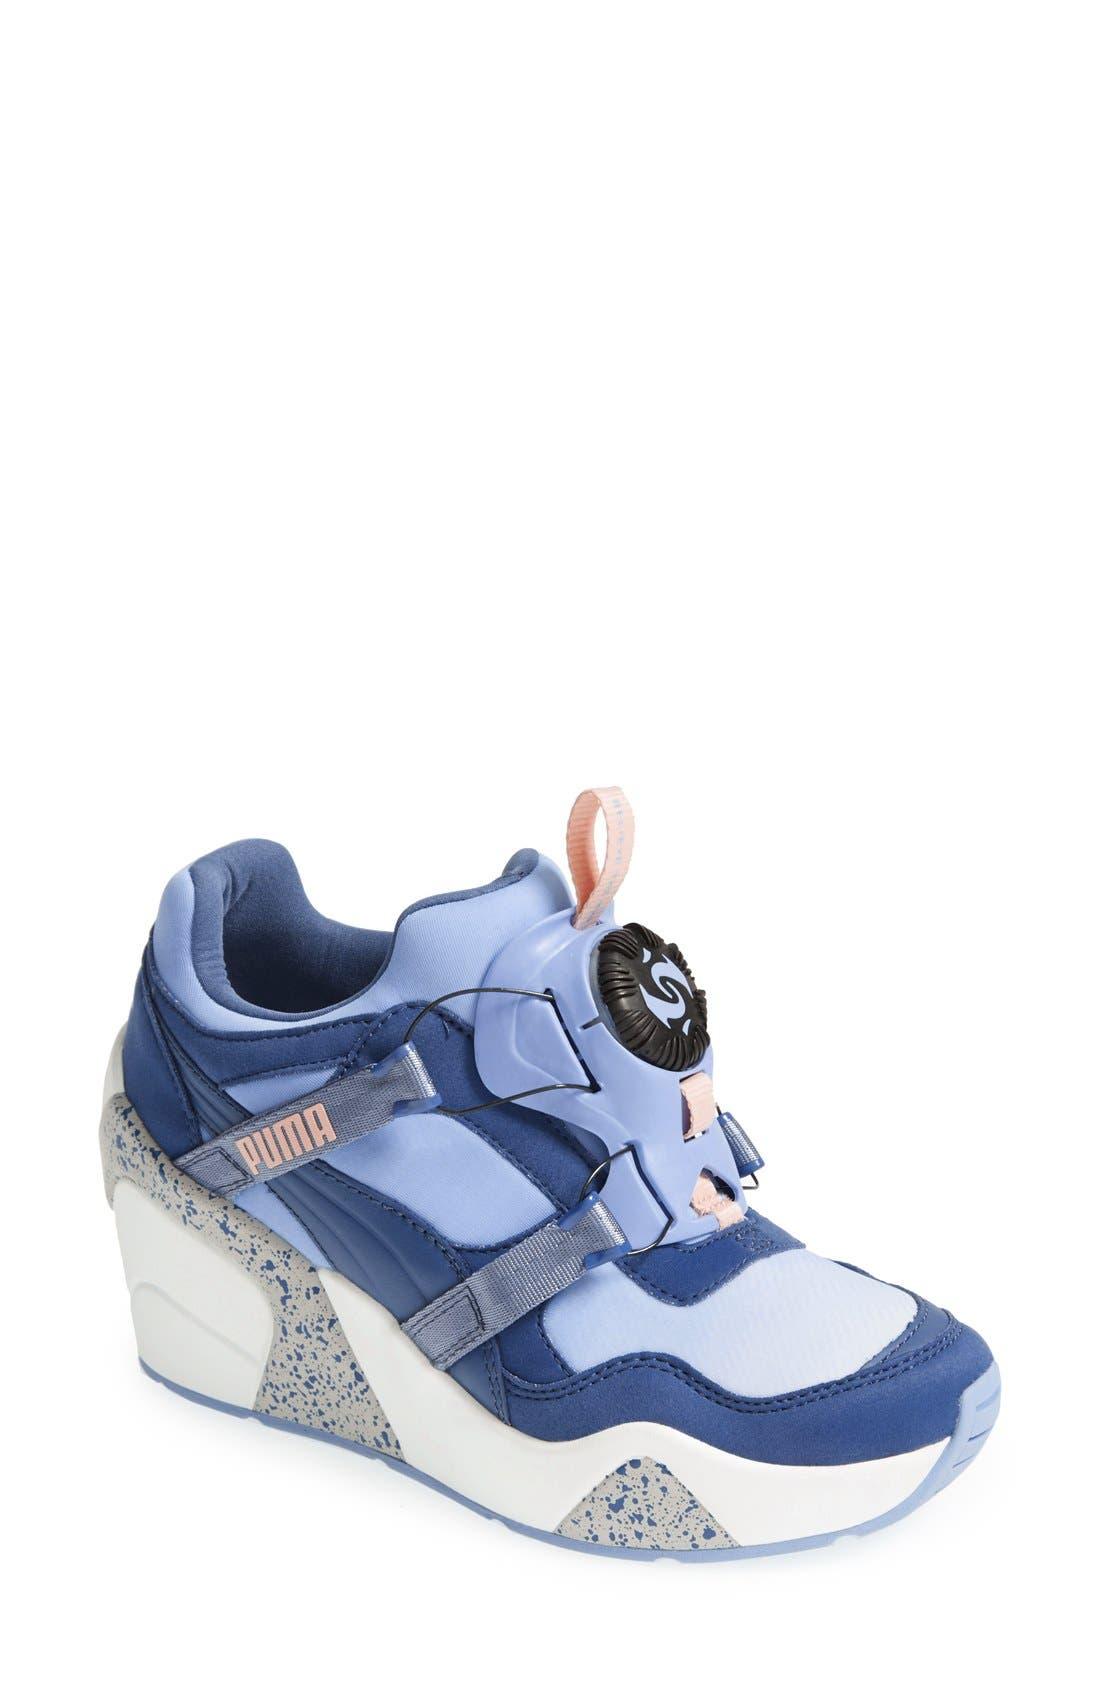 Alternate Image 1 Selected - PUMA 'Disc Trinomic - Sophia Chang' Wedge Sneaker (Women)